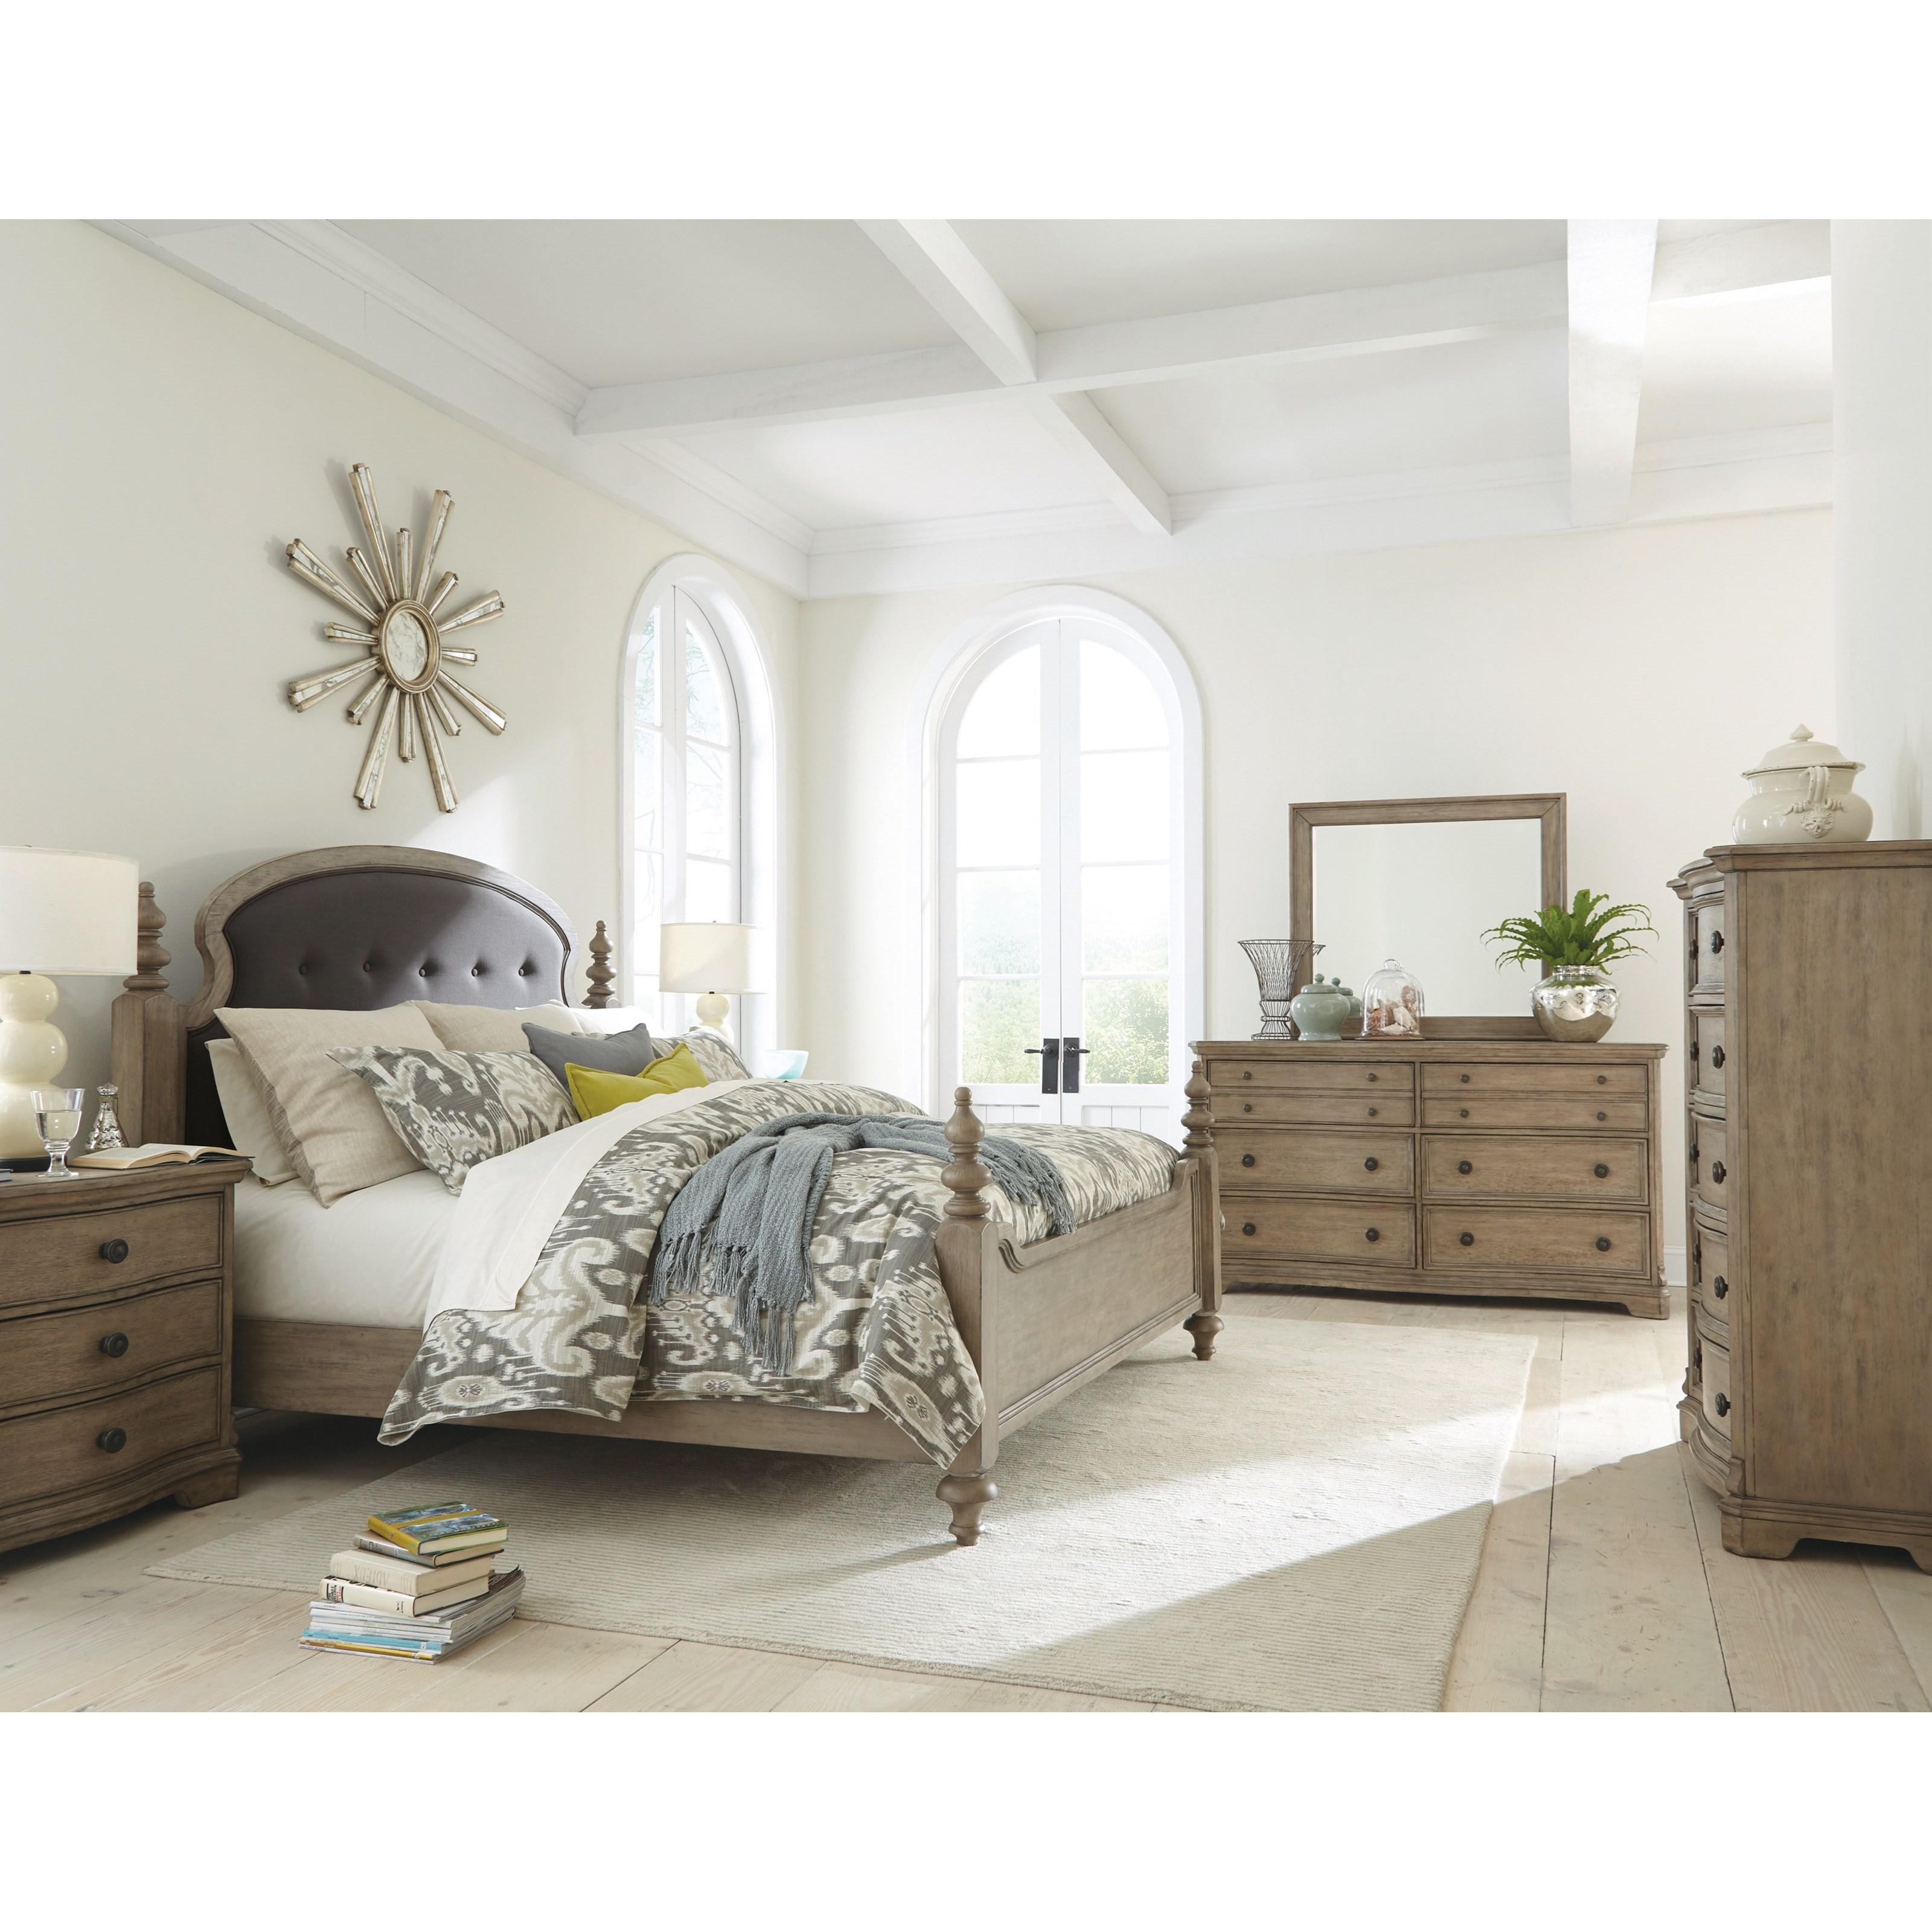 Riverside Furniture Corinne Queen Upholstered Poster Bed